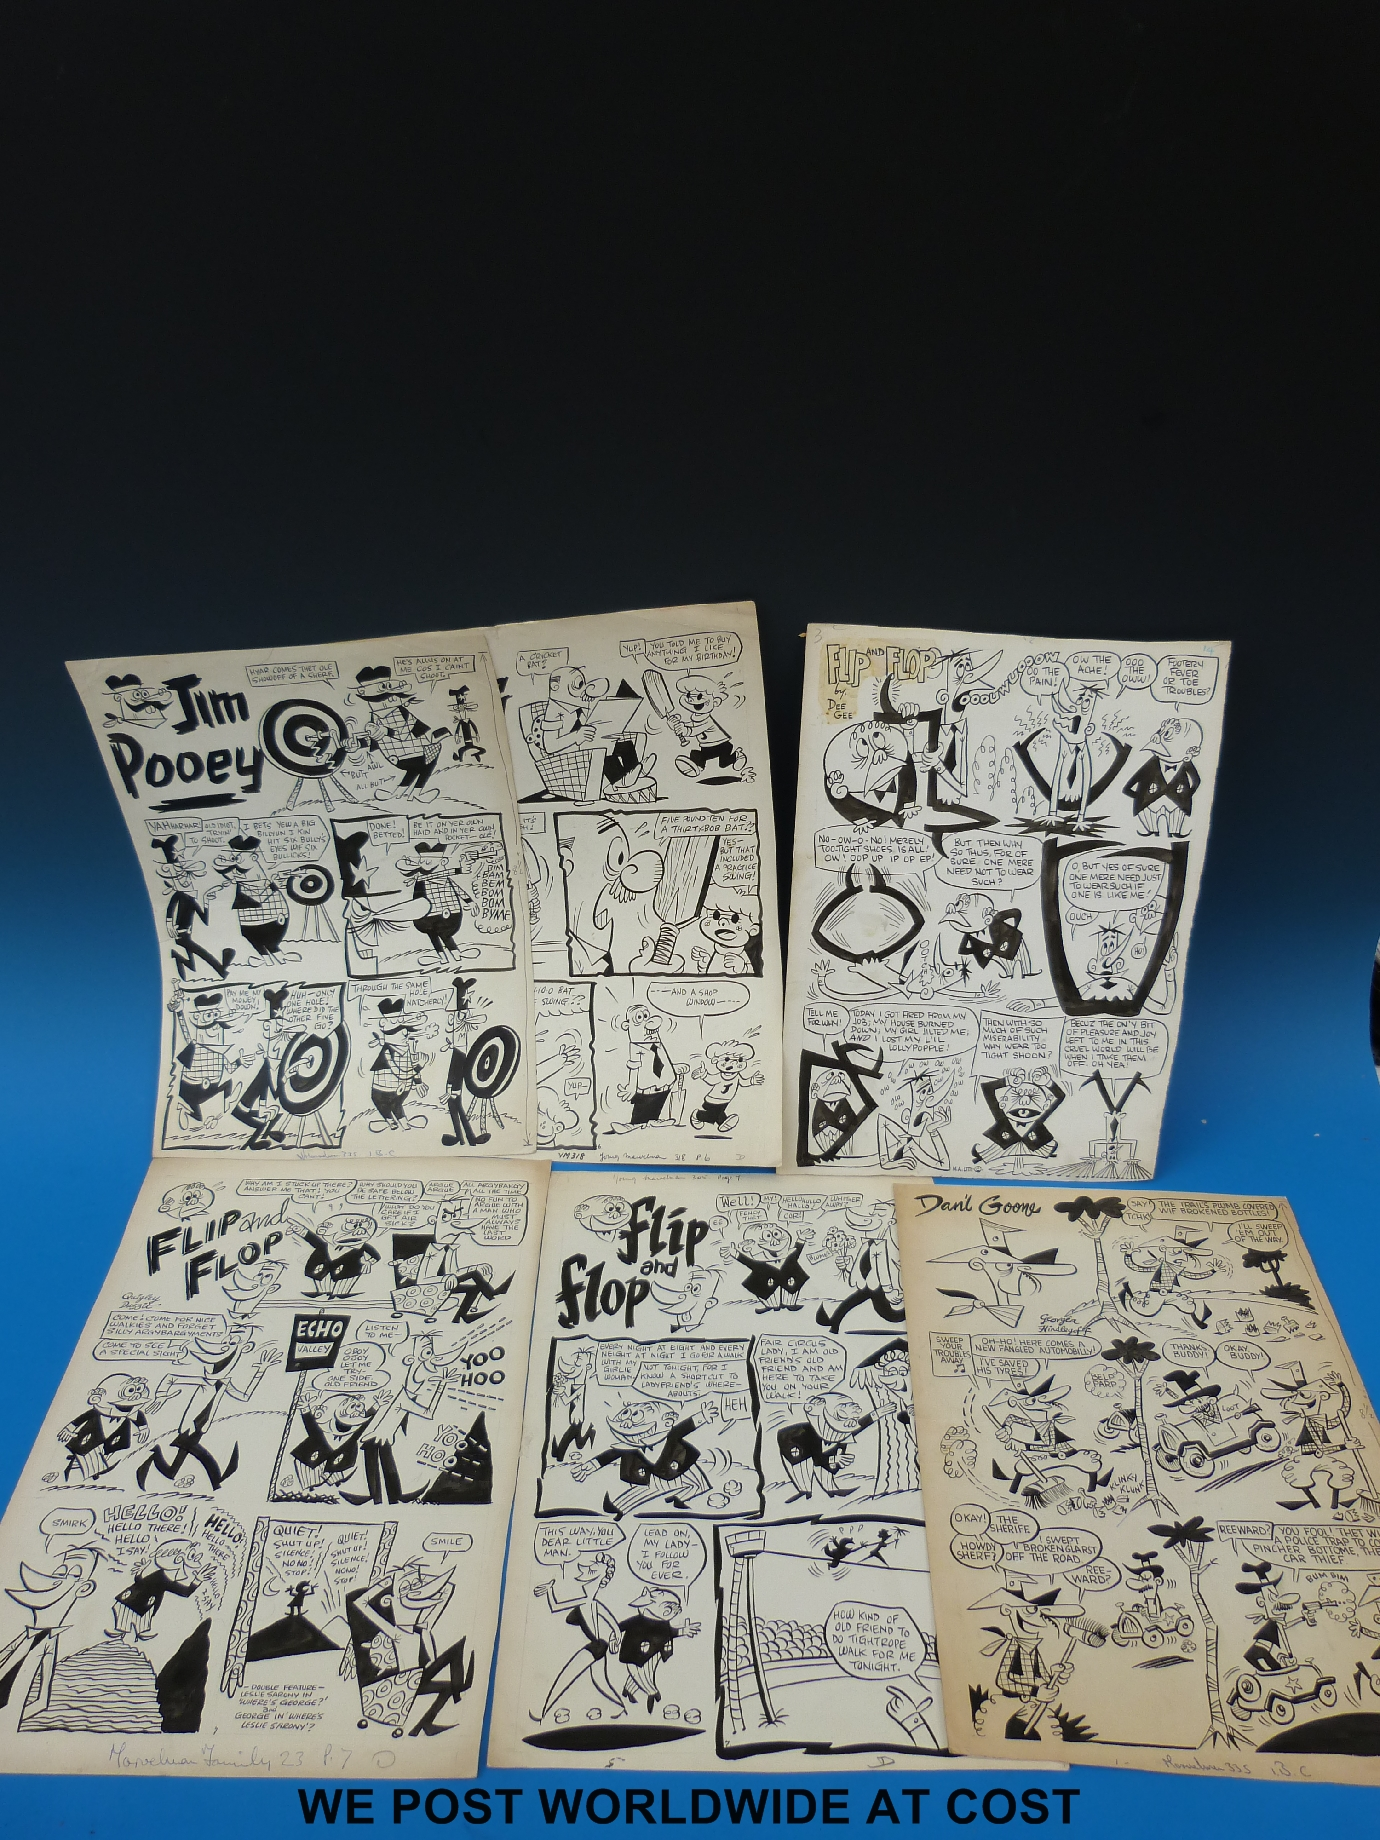 Lot 903 - Marvelman artist cartoon comic pages from 1950s Marvelman/ Familt, Flip & Flop, Friendly Sole,